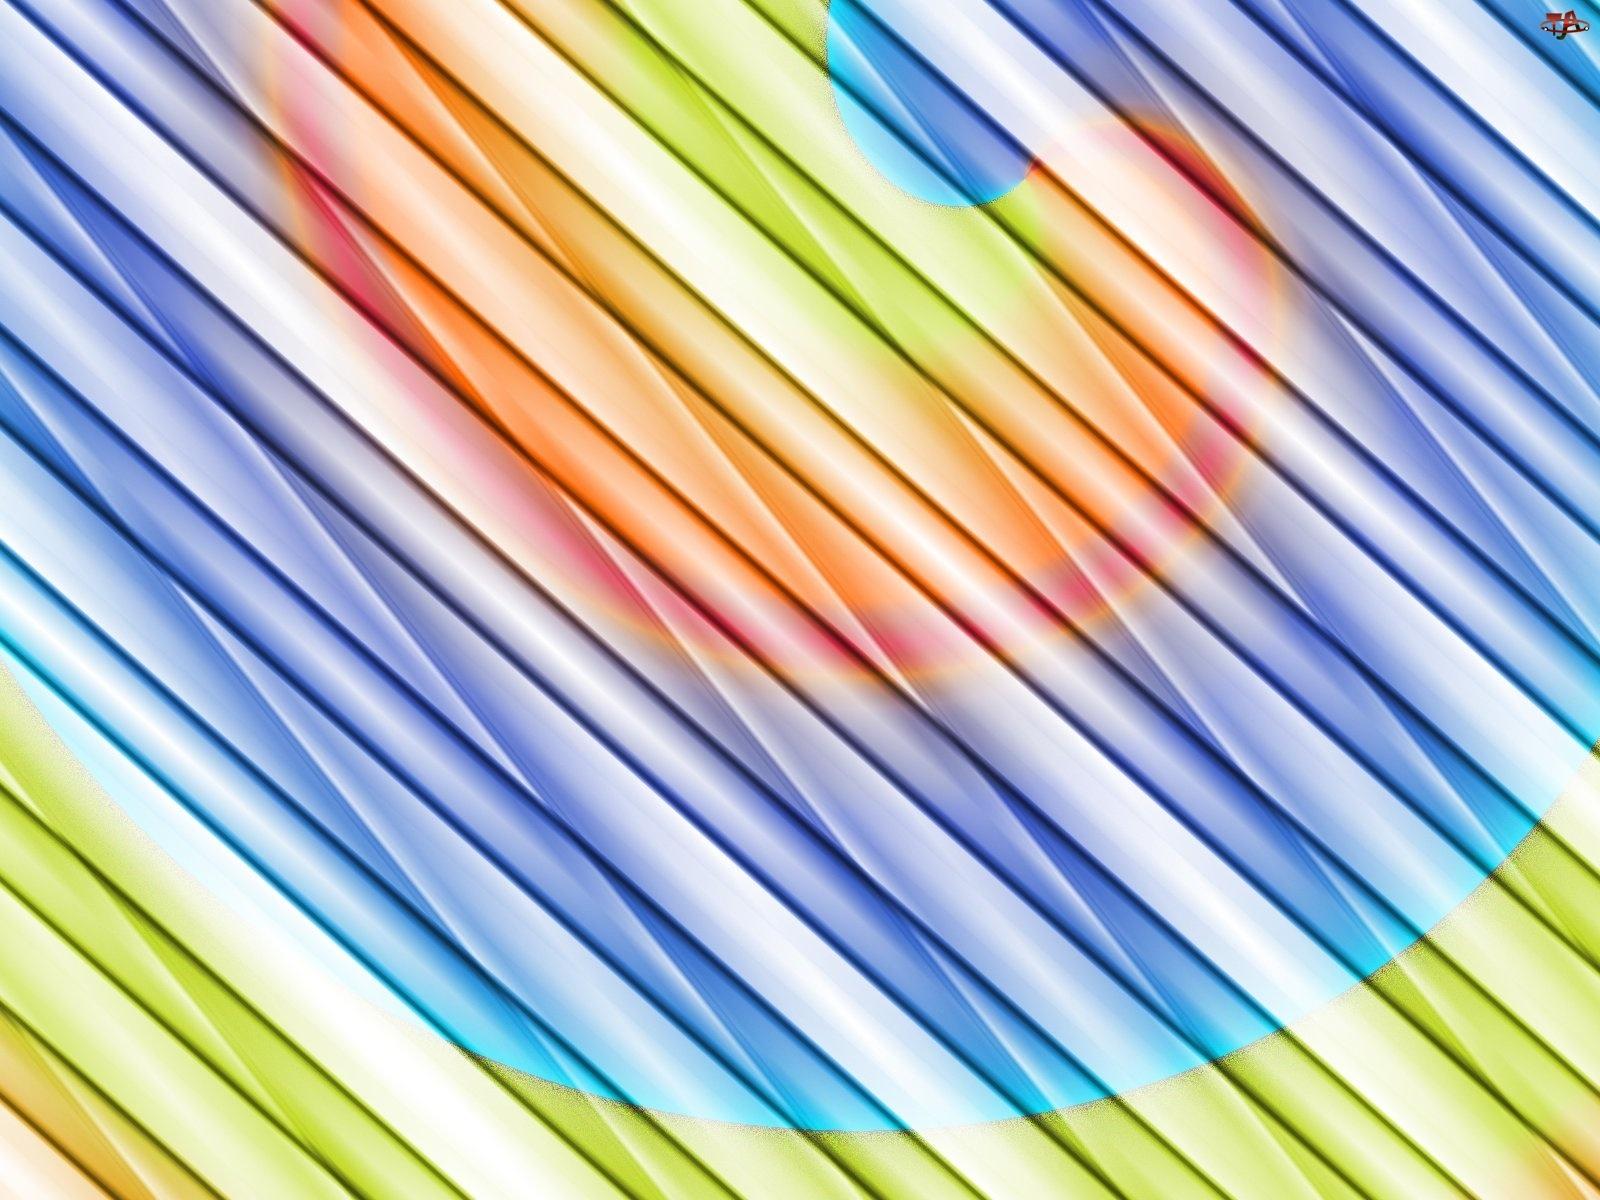 Tekstura, Kolorowe, Paski